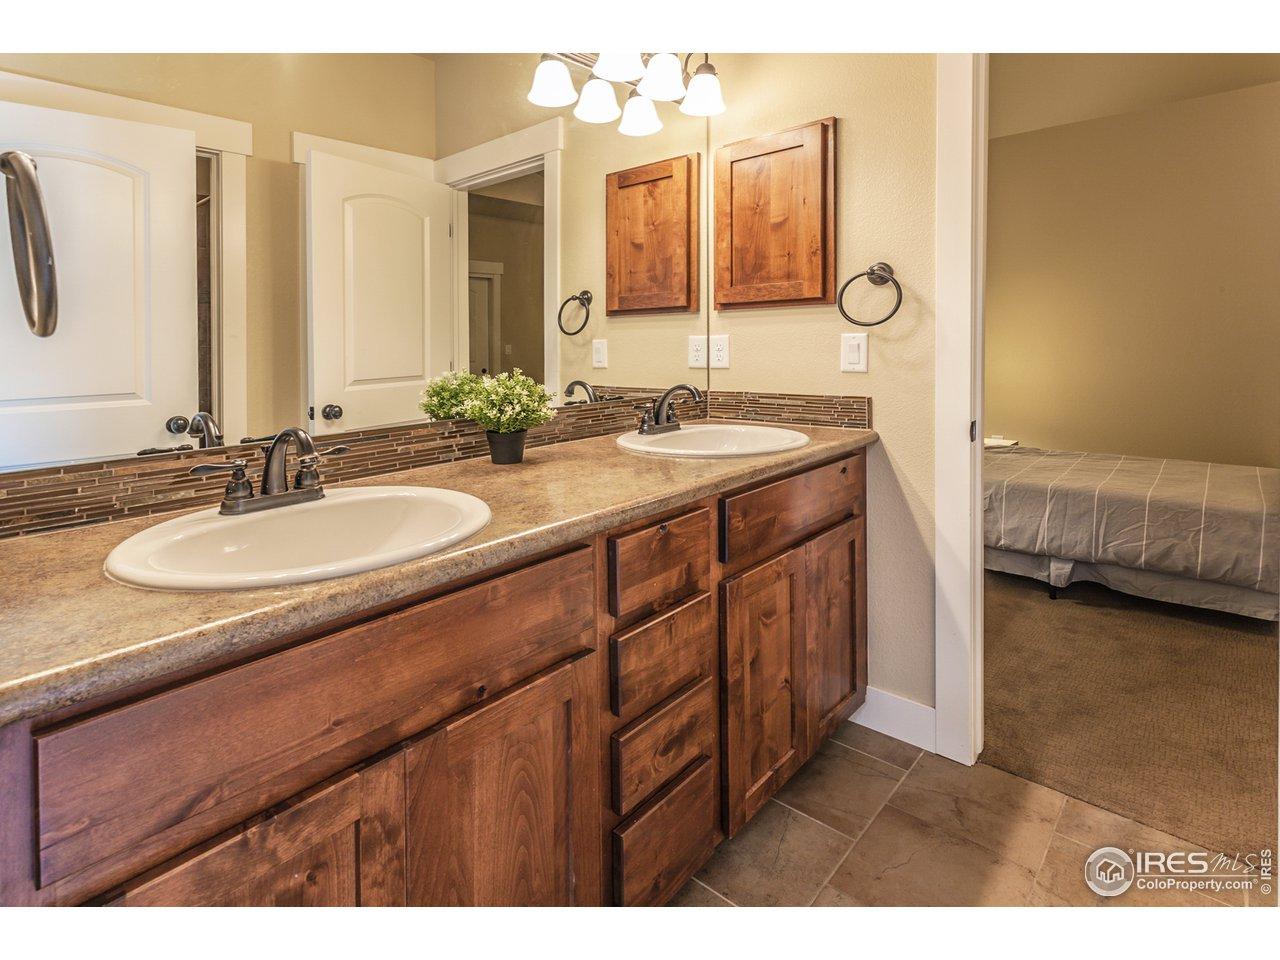 Twin sinks in shared full bathroom upstairs